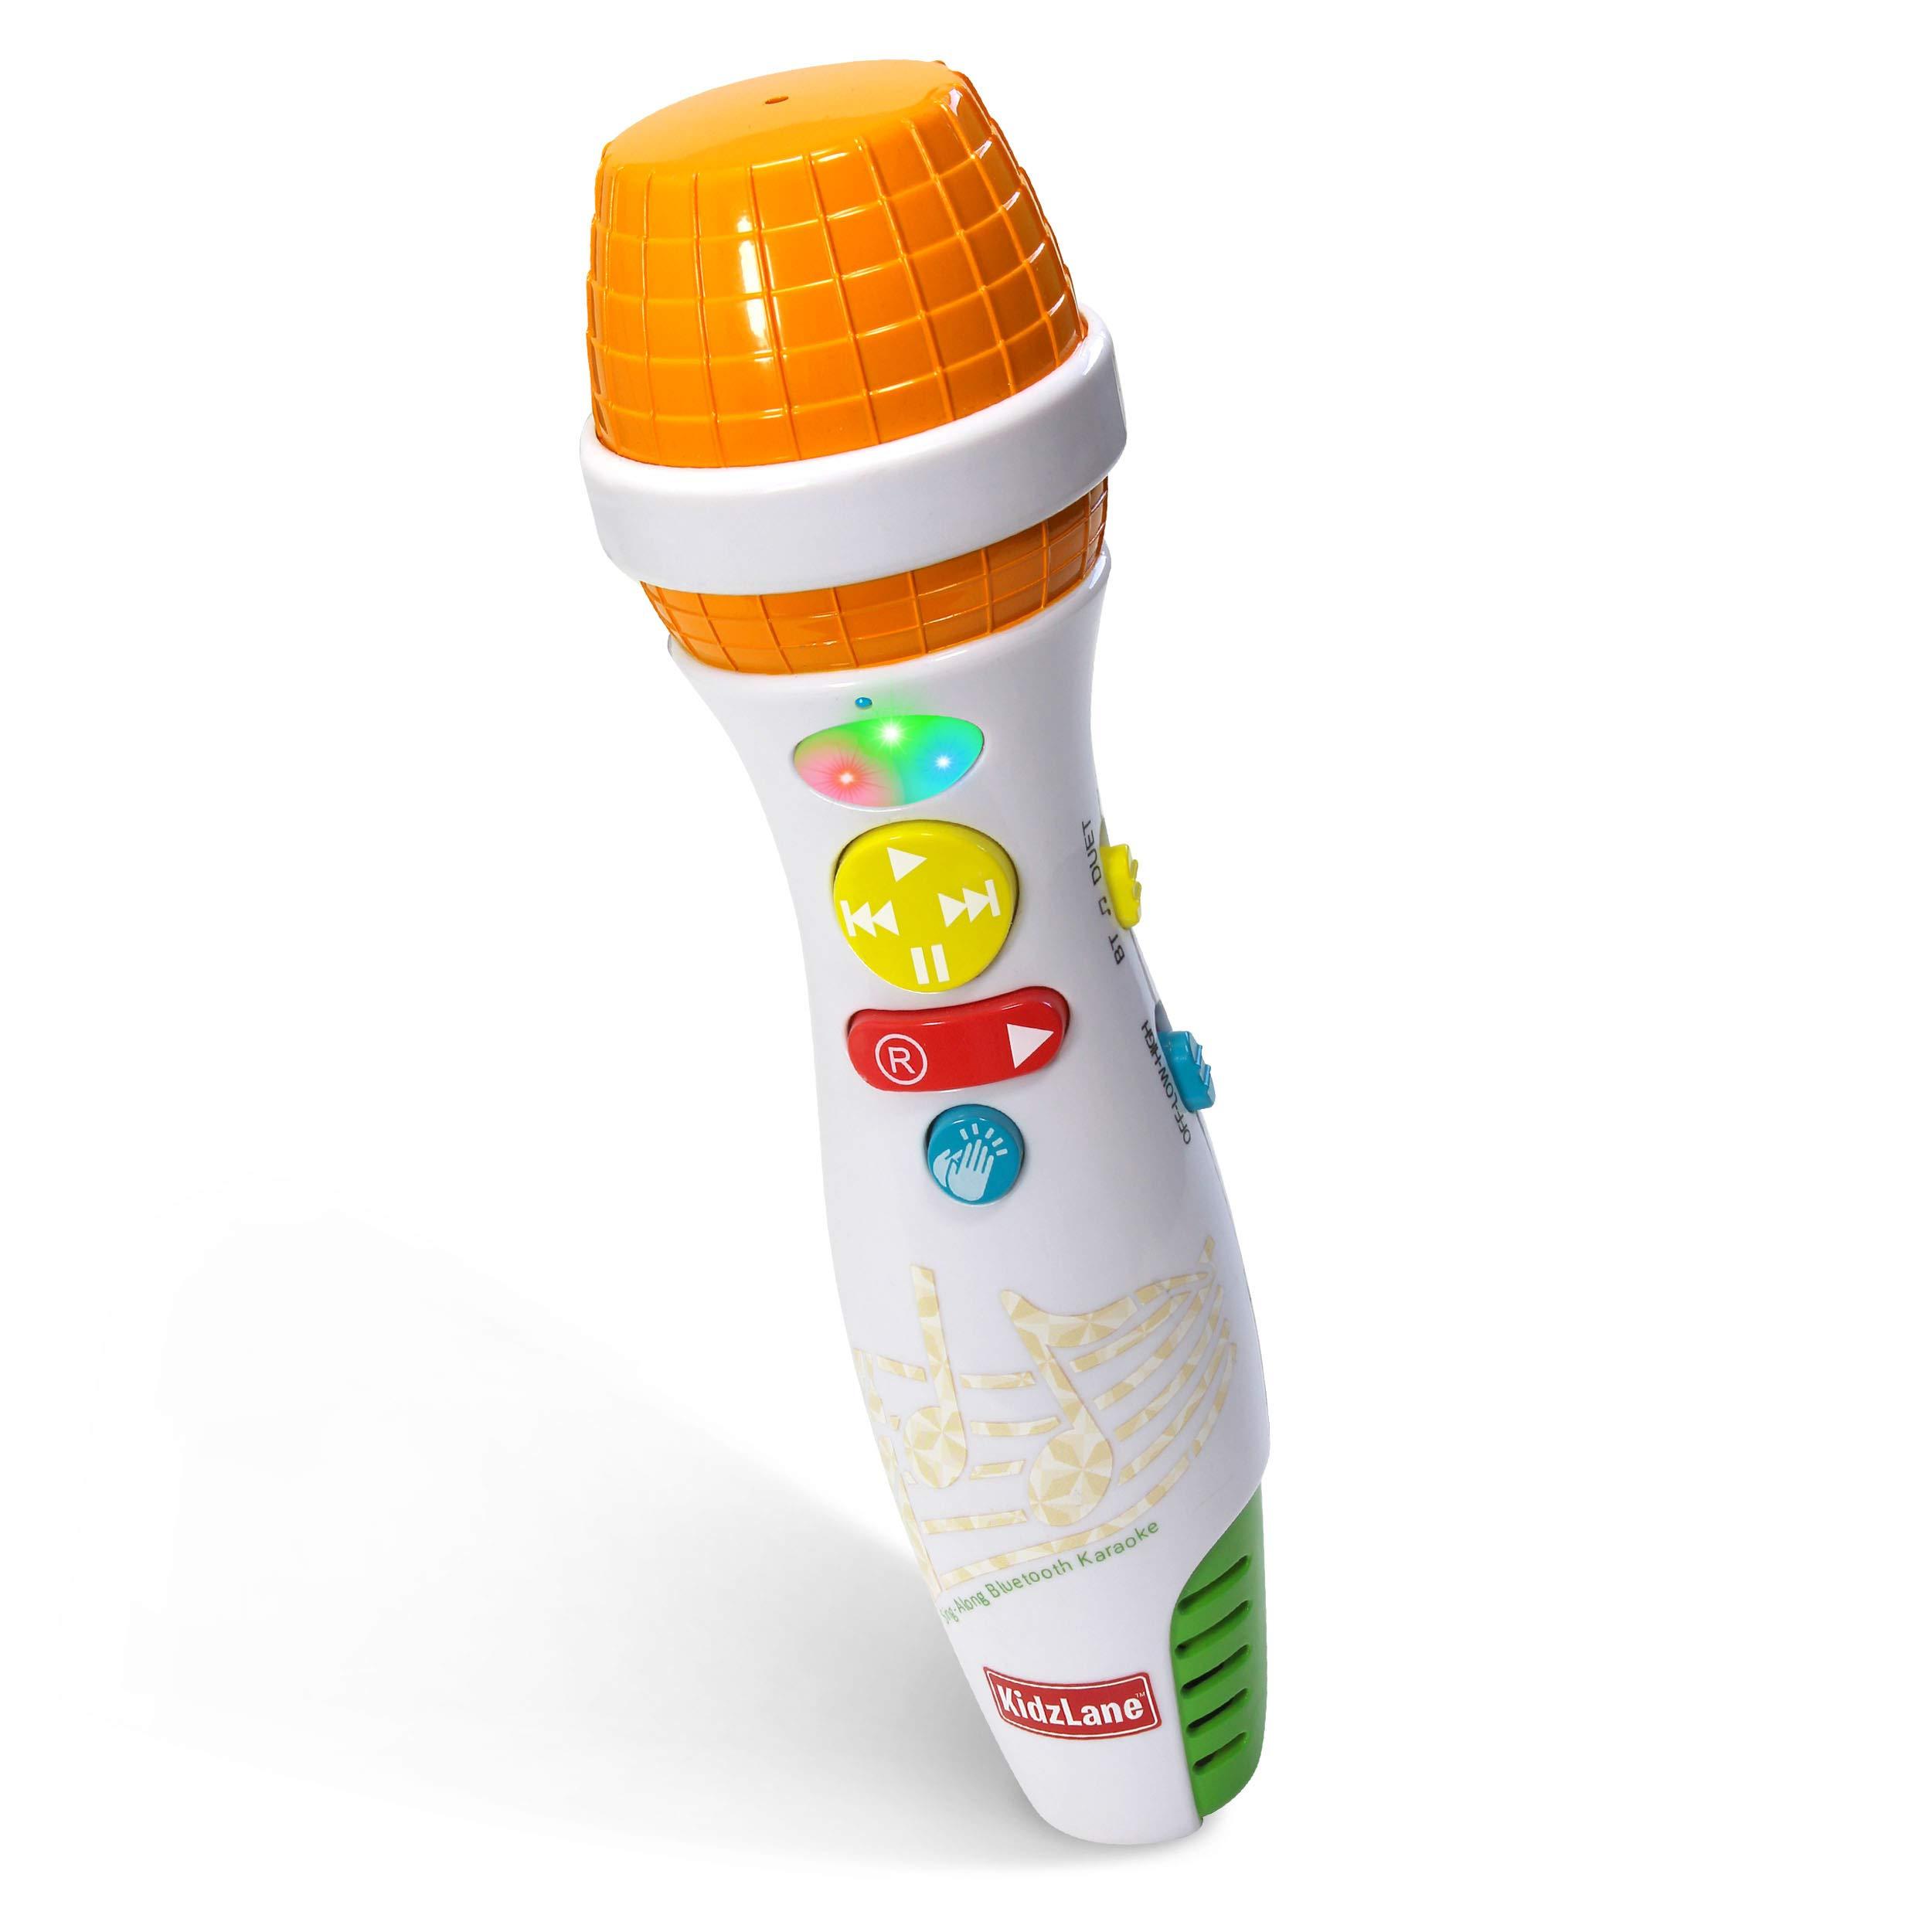 Kidzlane Kids Karaoke Microphone with Bluetooth, Voice Changer, and 10 Built-in Nursery Rhymes